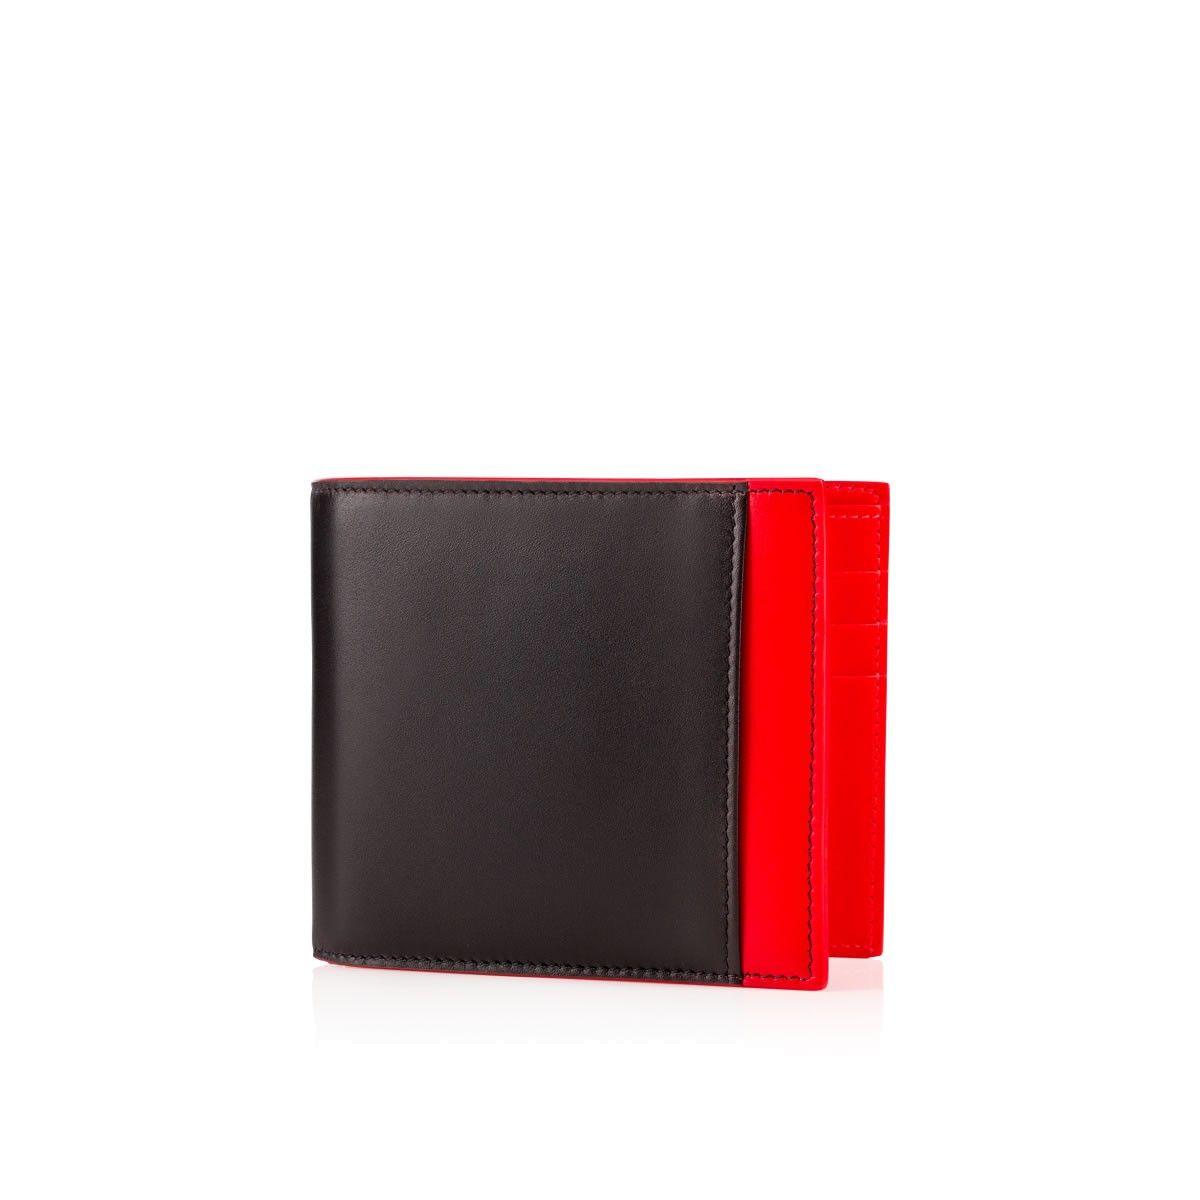 christian louboutin wallet online